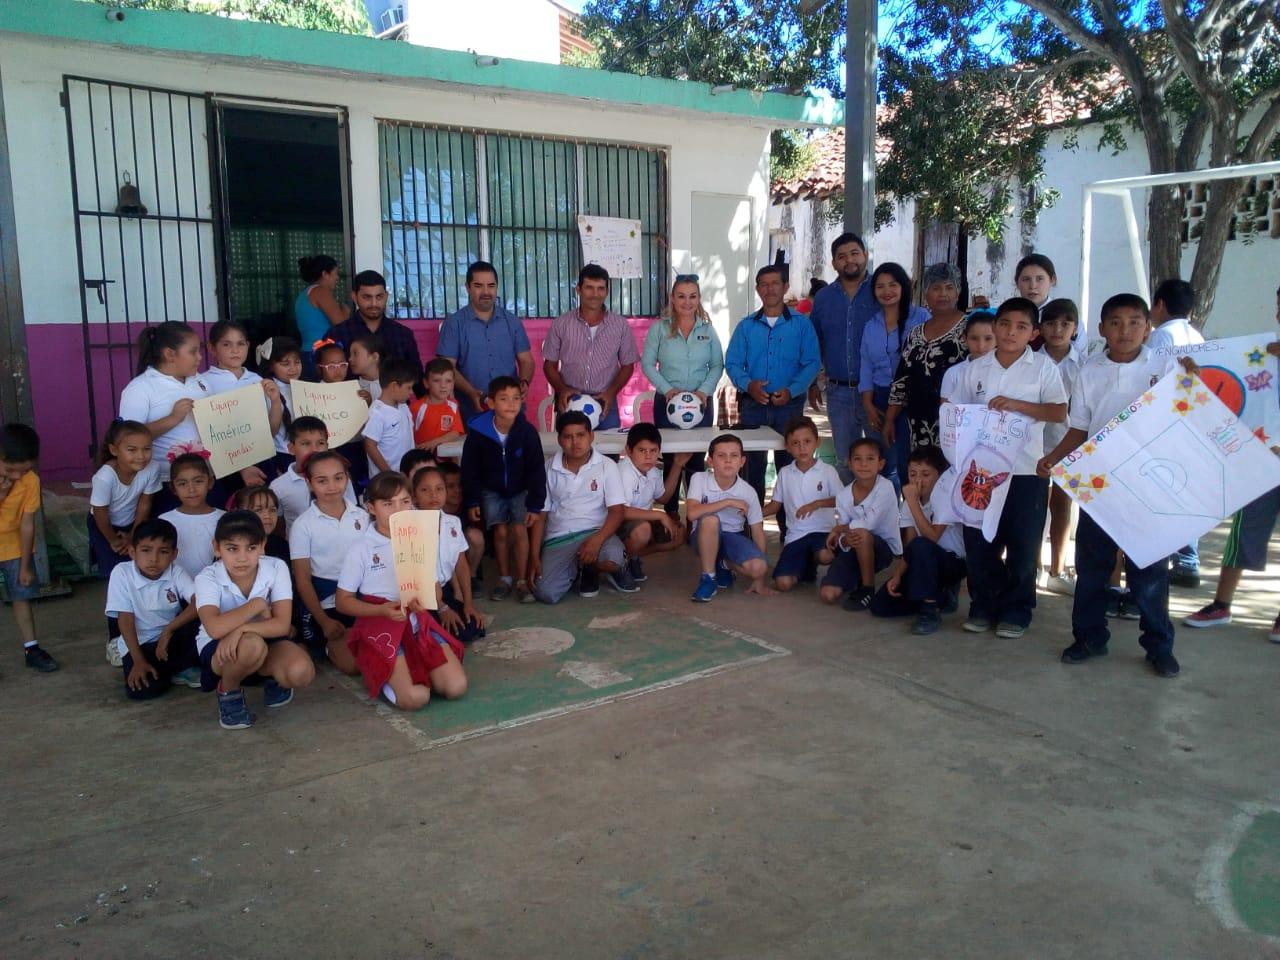 Escuela General Carrasco se une al Programa Deportivo del Imdem